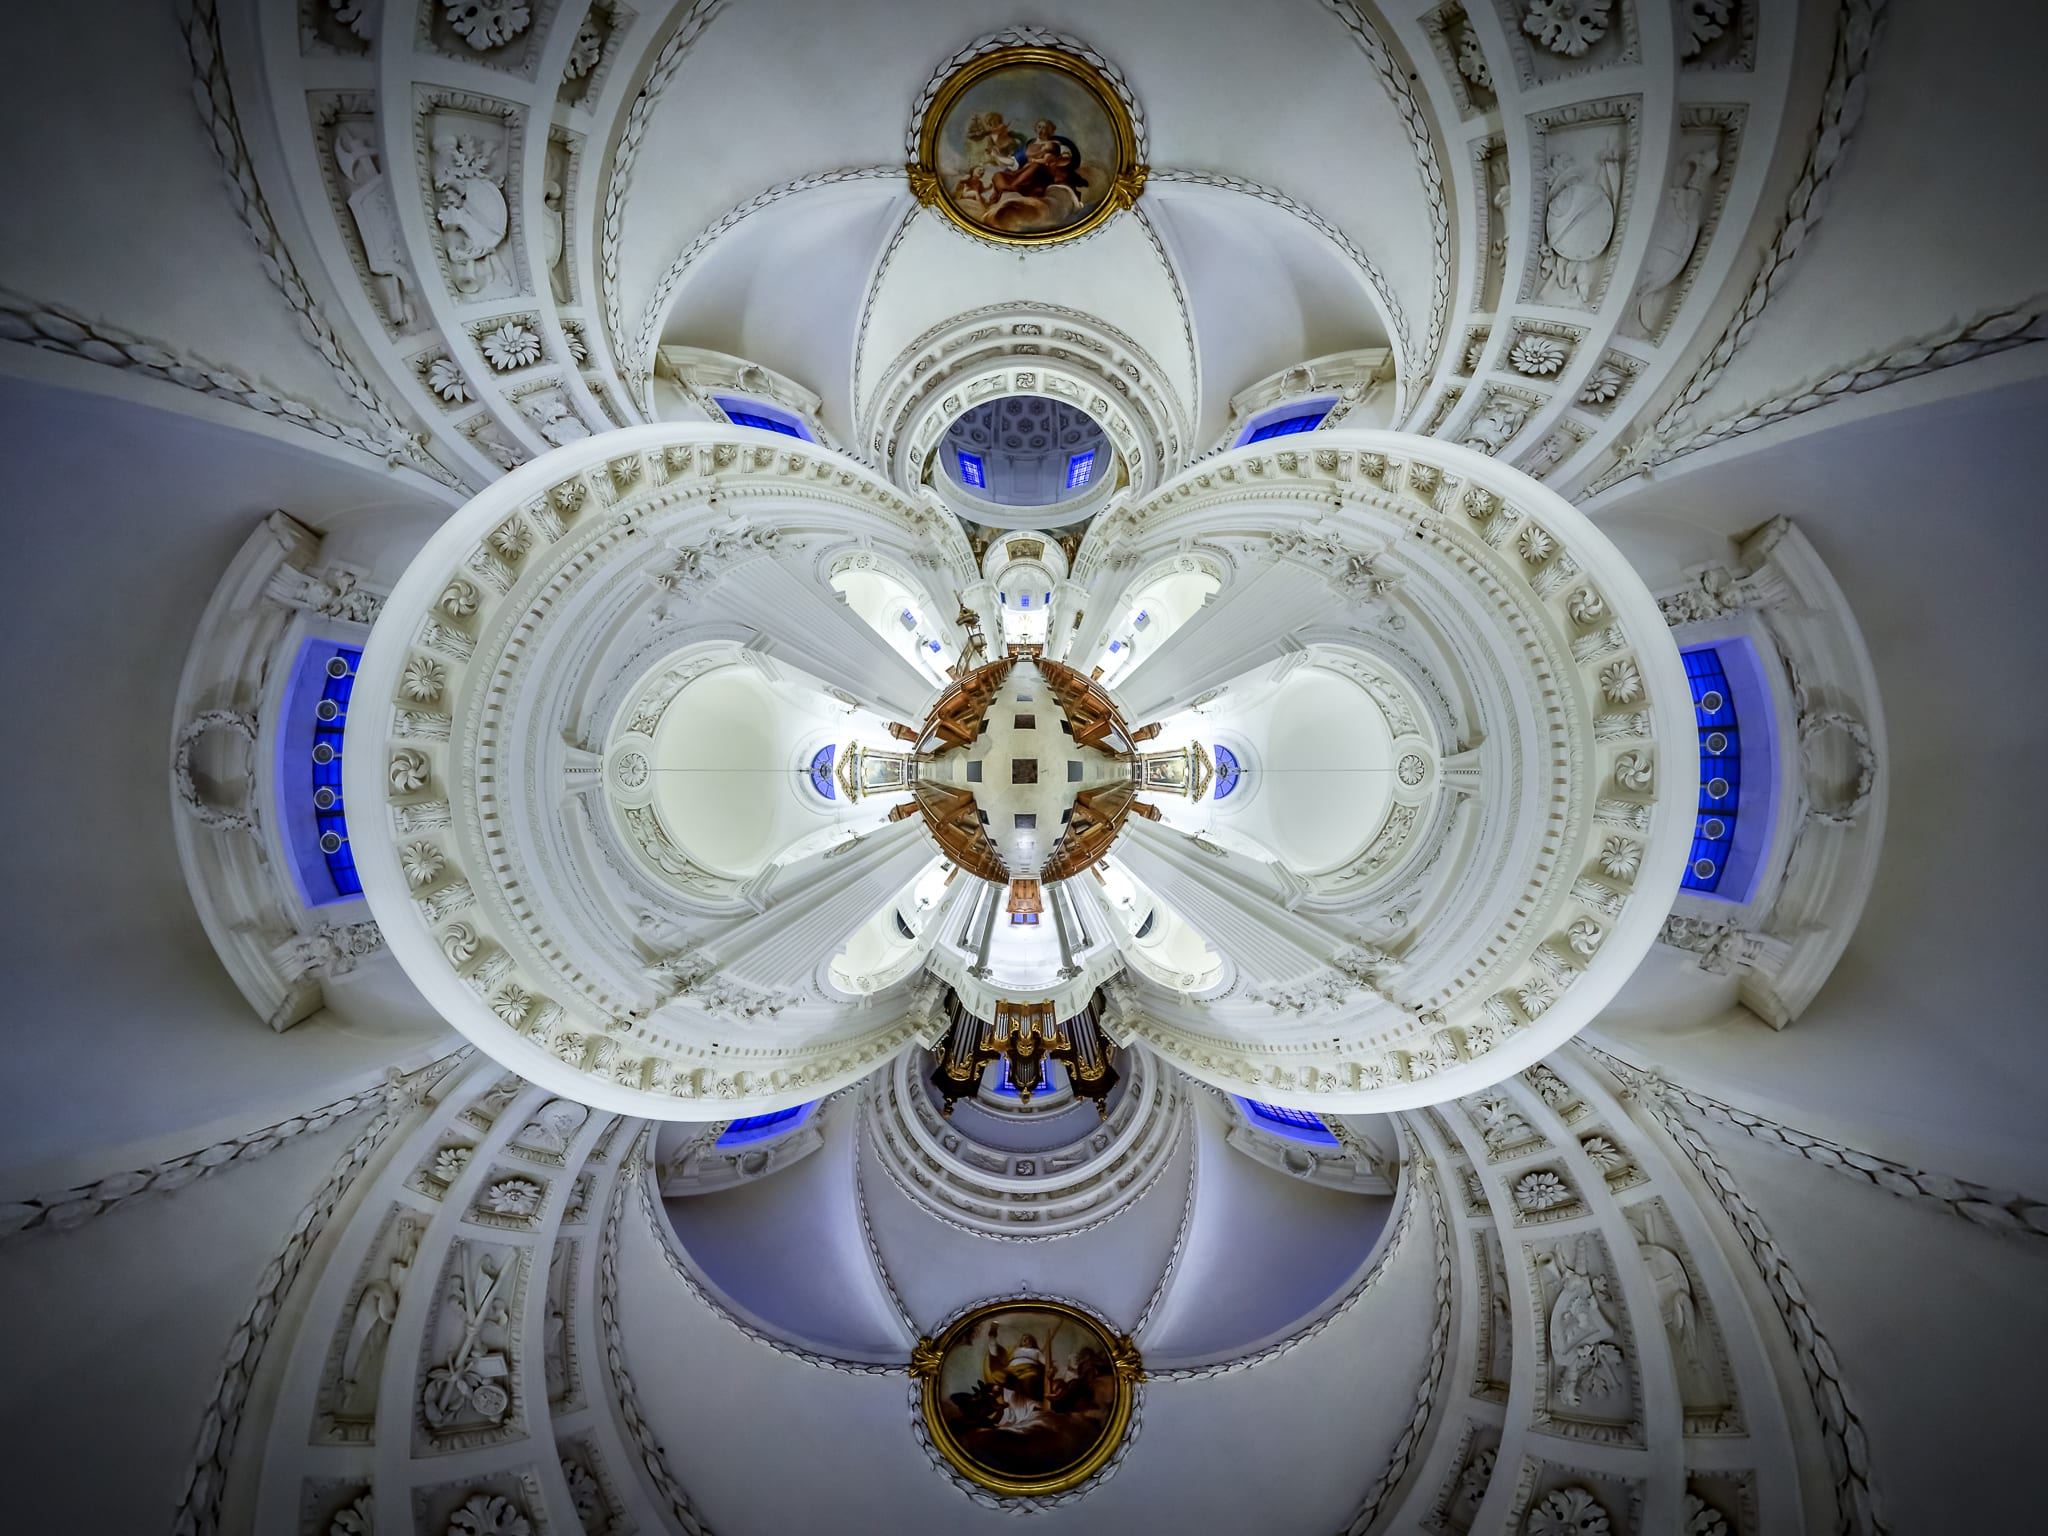 Stereografisches Panorama der St. St. Ursenkathedrale in Solothrun